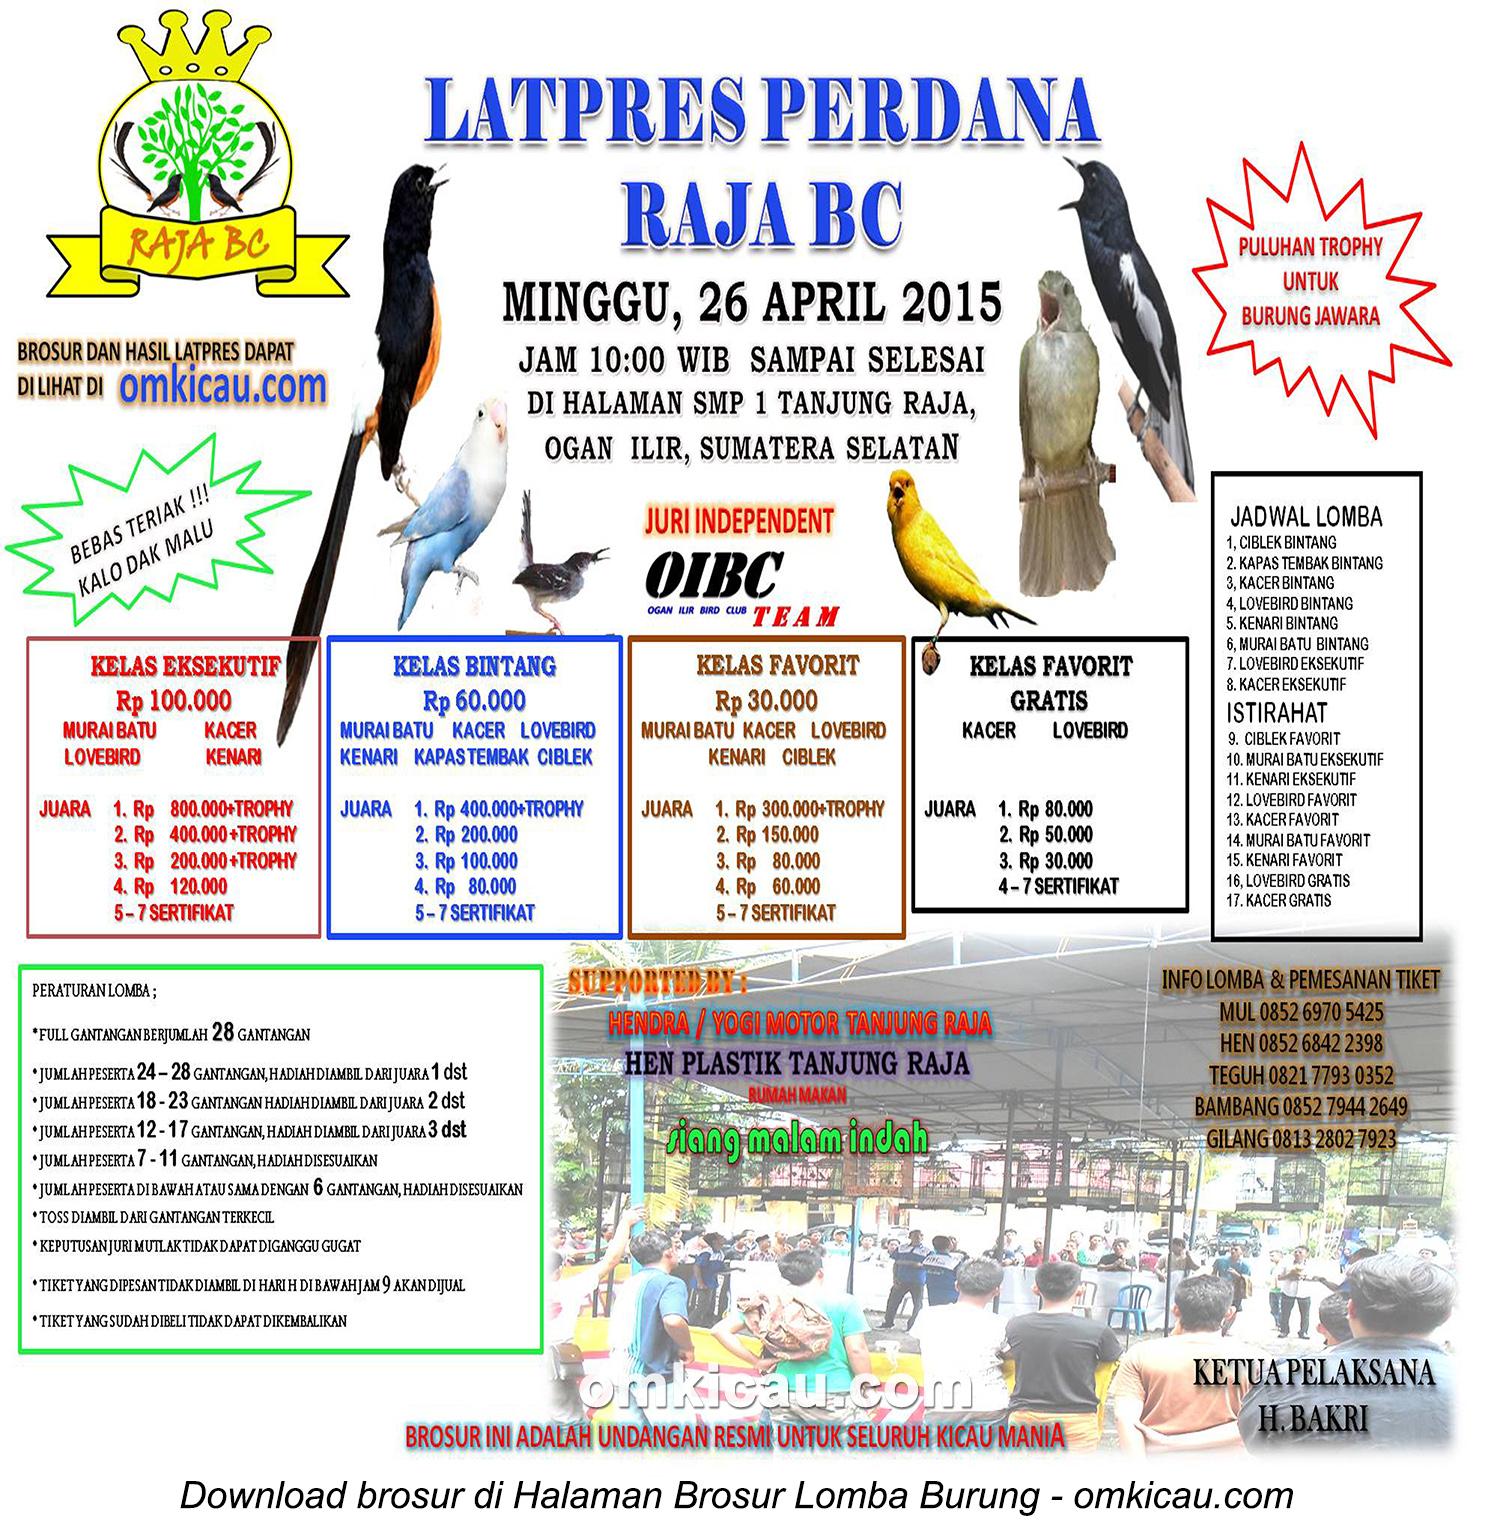 Brosur Latpres Perdana Raja BC, Ogan Ilir, 26 April 2015